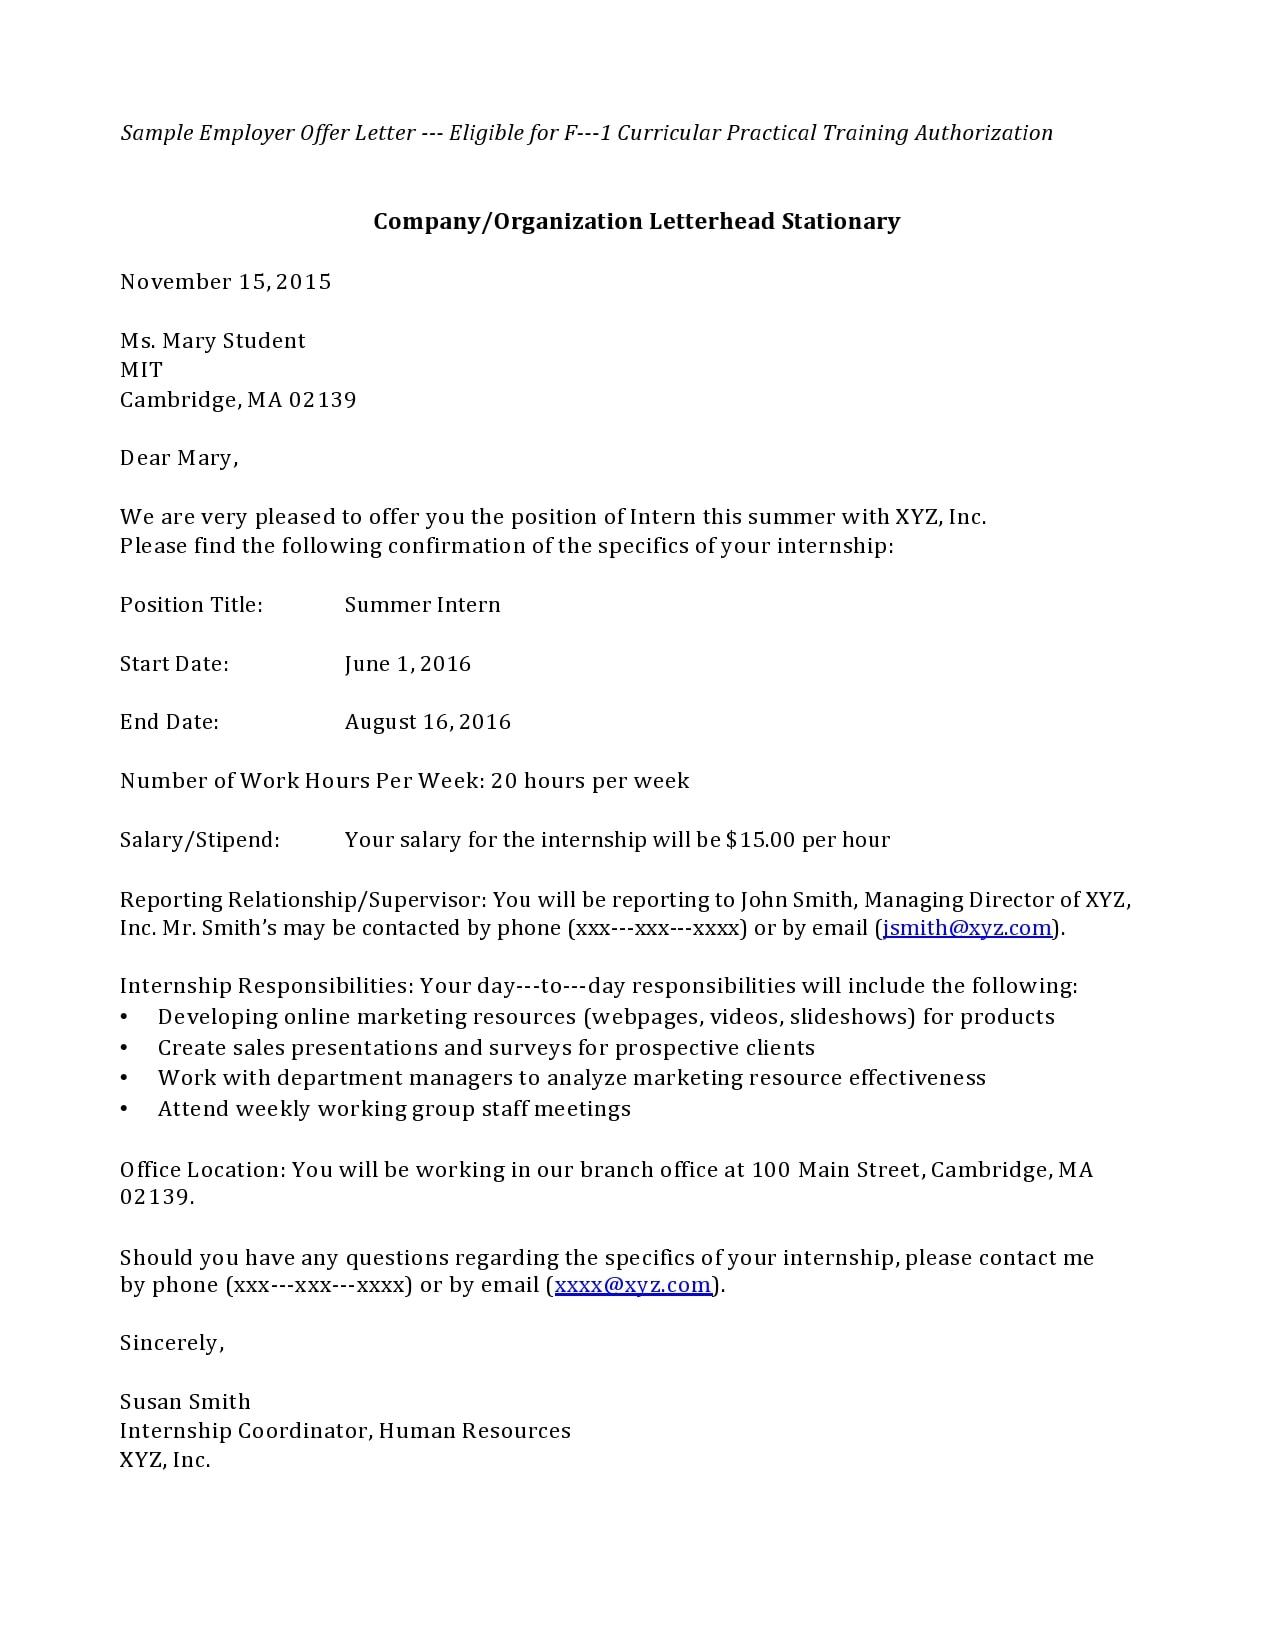 internship offer letter 07